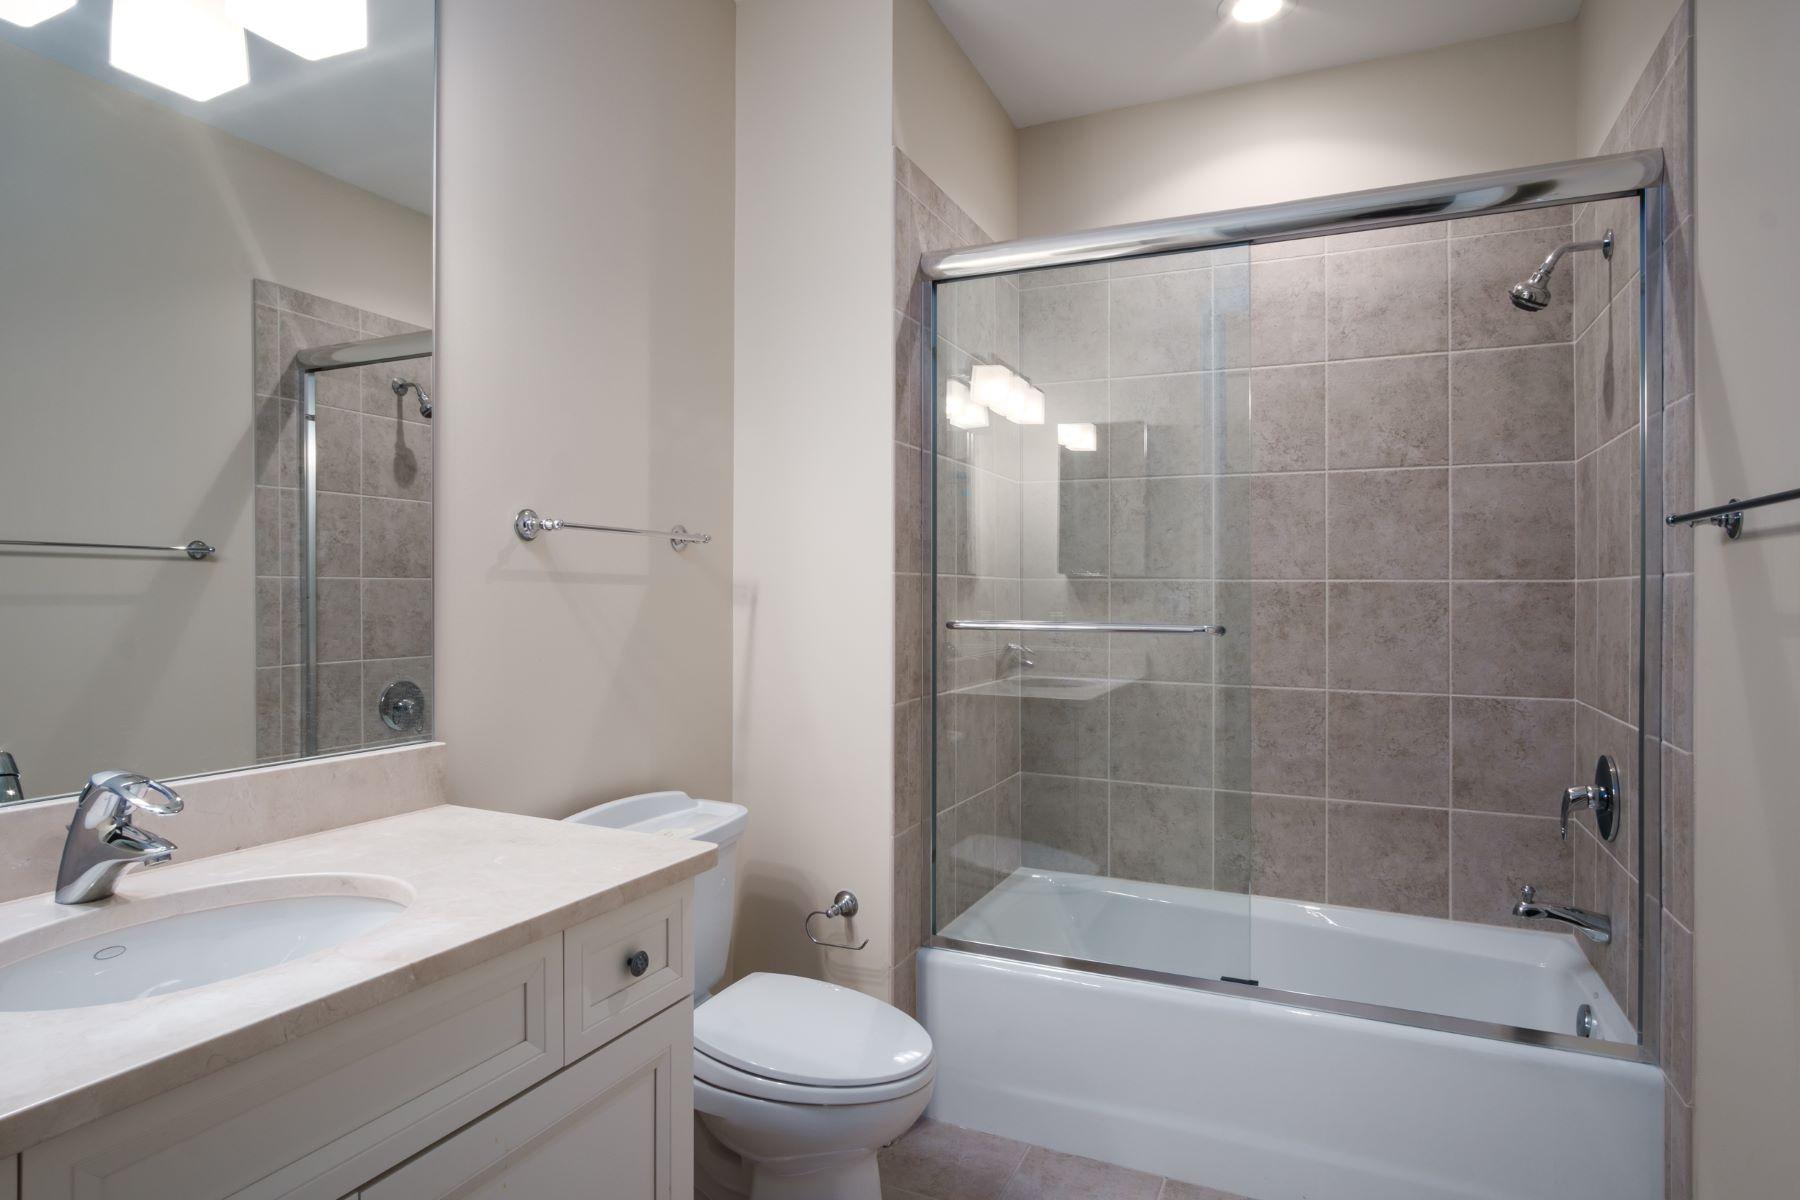 Additional photo for property listing at 8025 Maryland Avenue 13E Clayton, Missouri 63105 United States